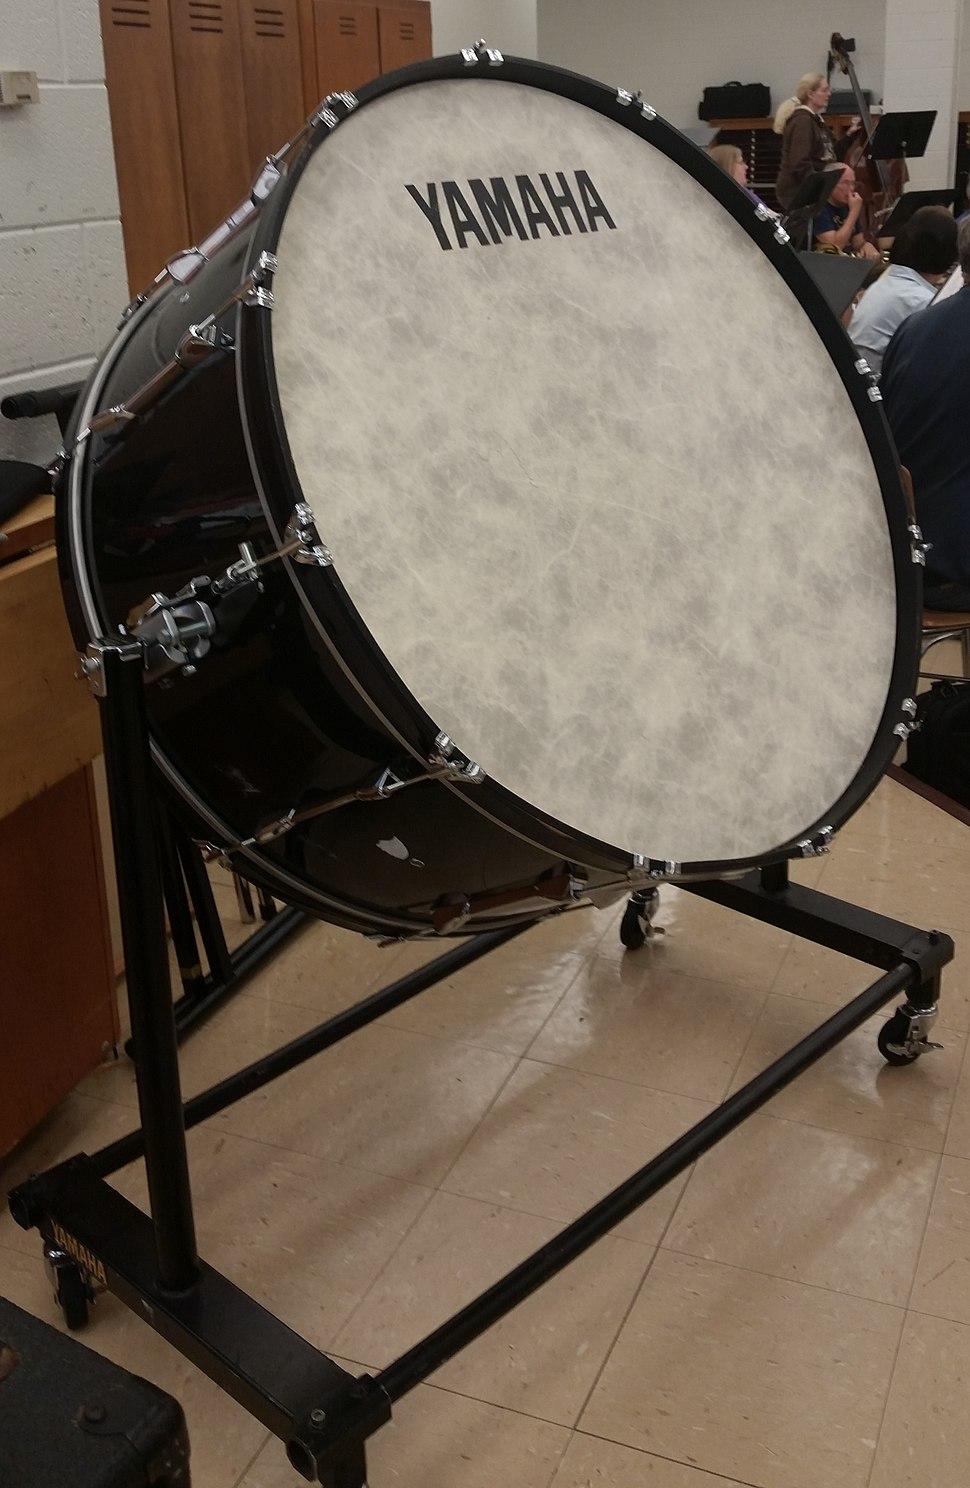 Mounted concert bass drum